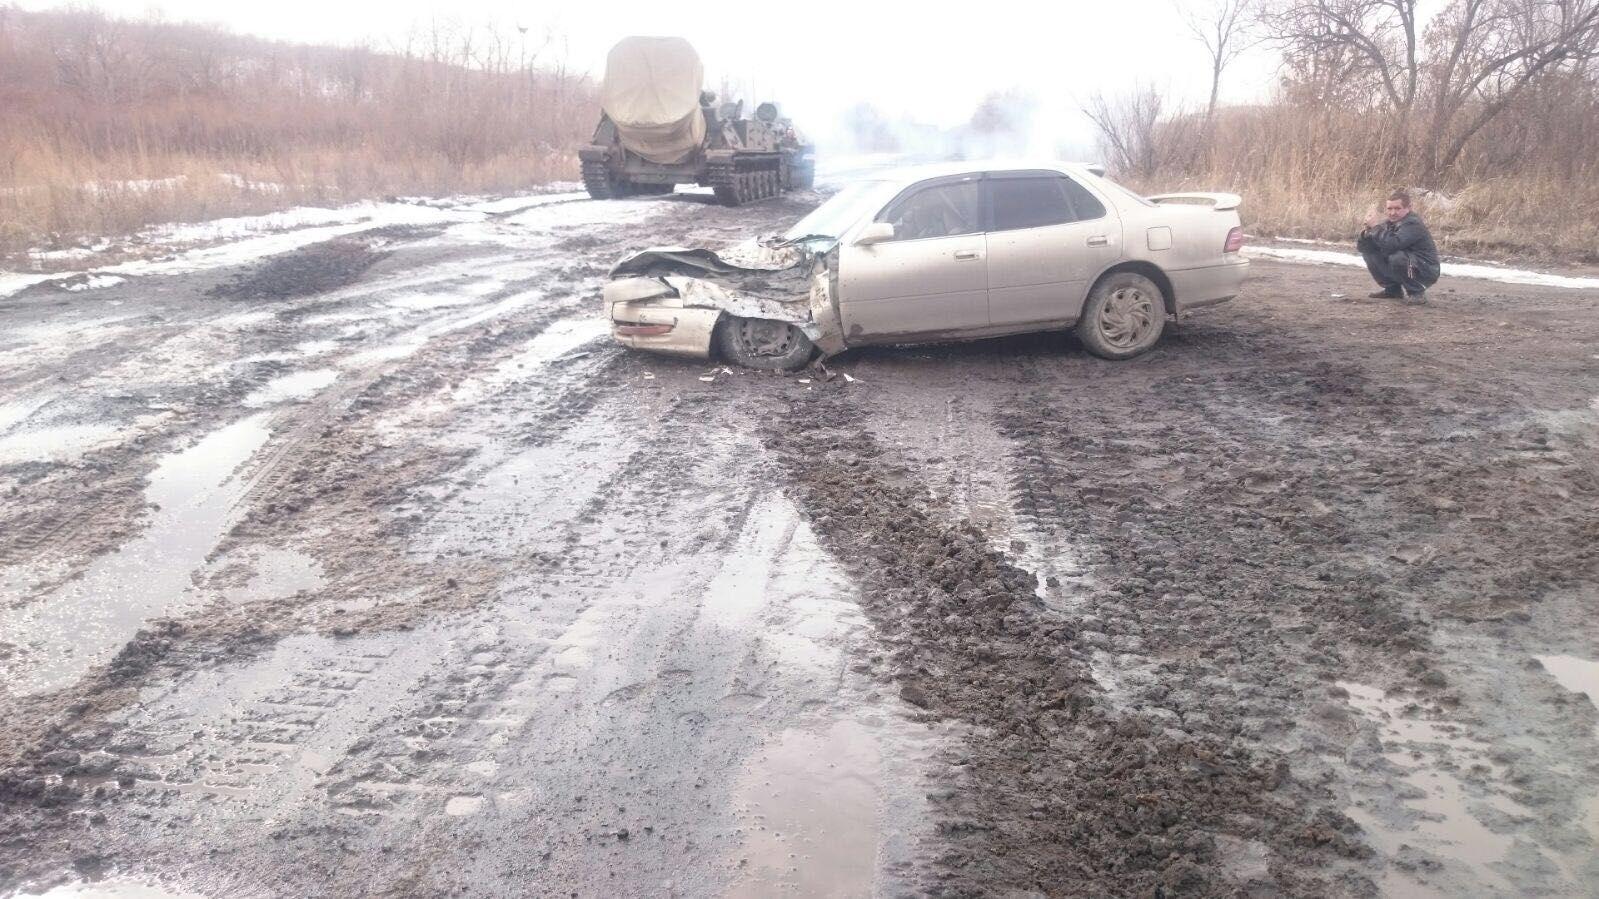 Self Propelled Mortar Tulpan vs Toyota Camry